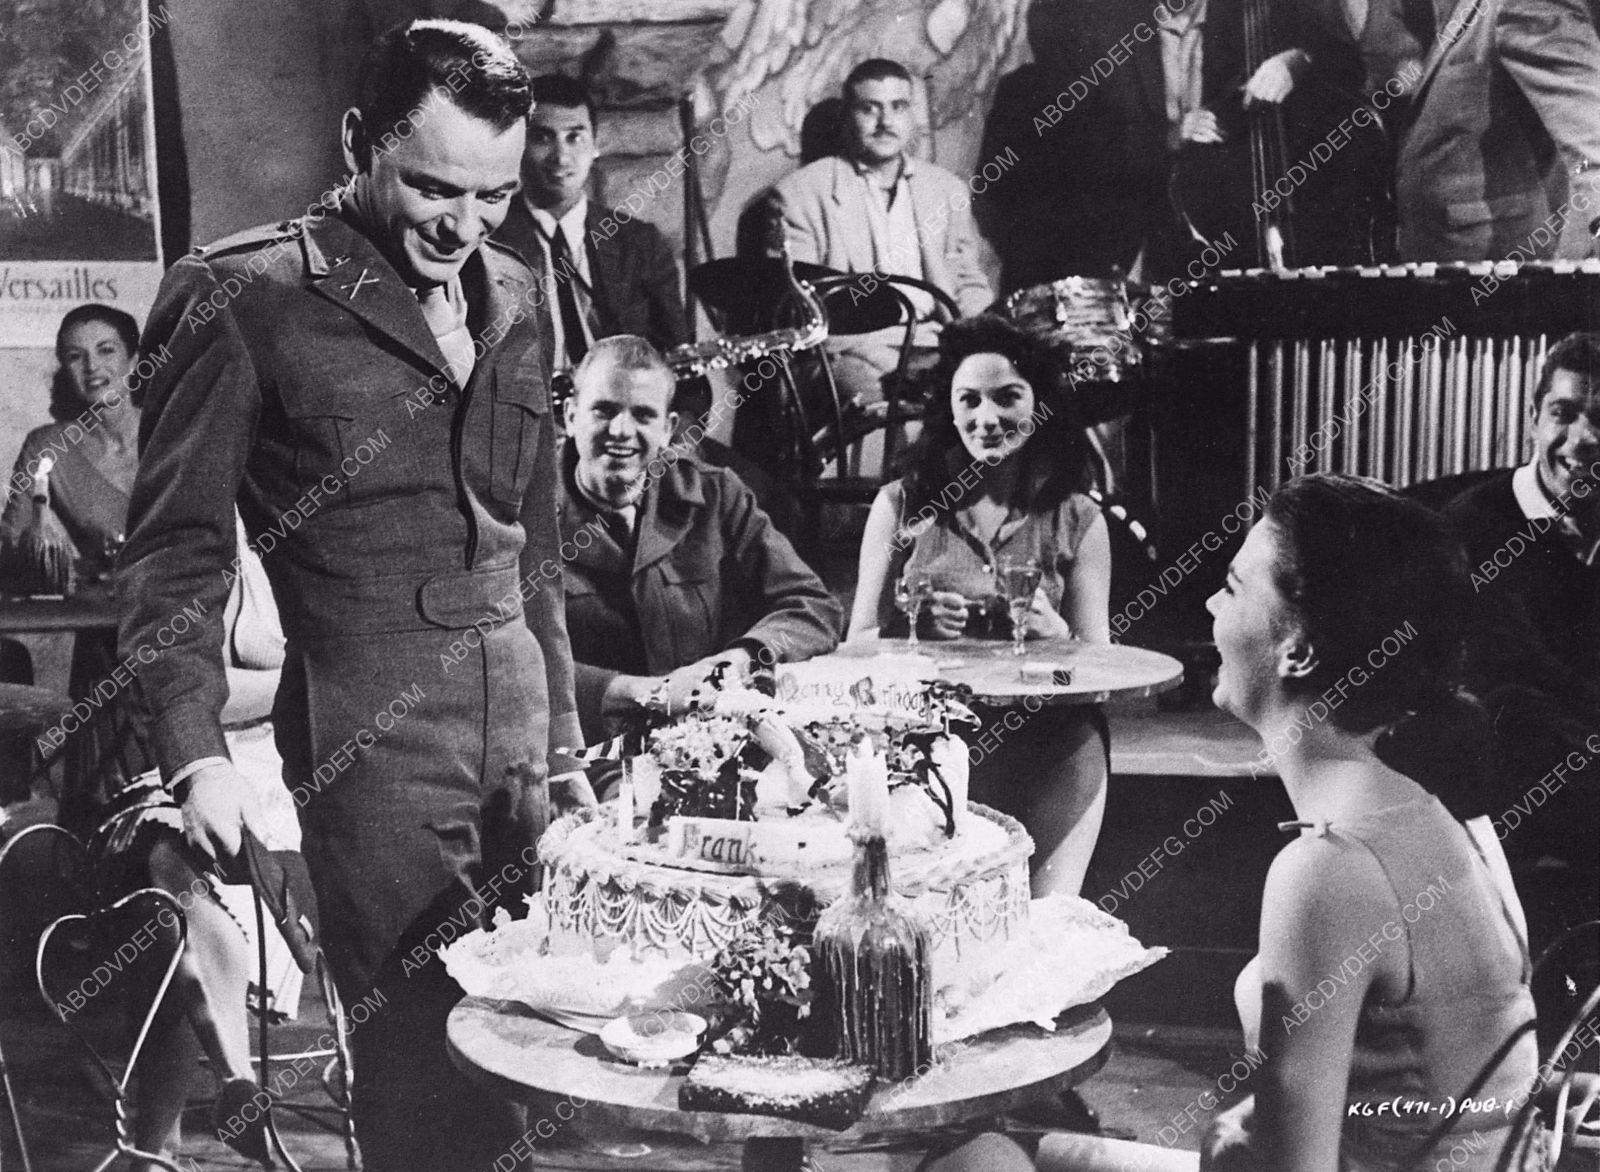 Photo Natalie Wood Candid Frank Sinatras Birthday Cake Behind The